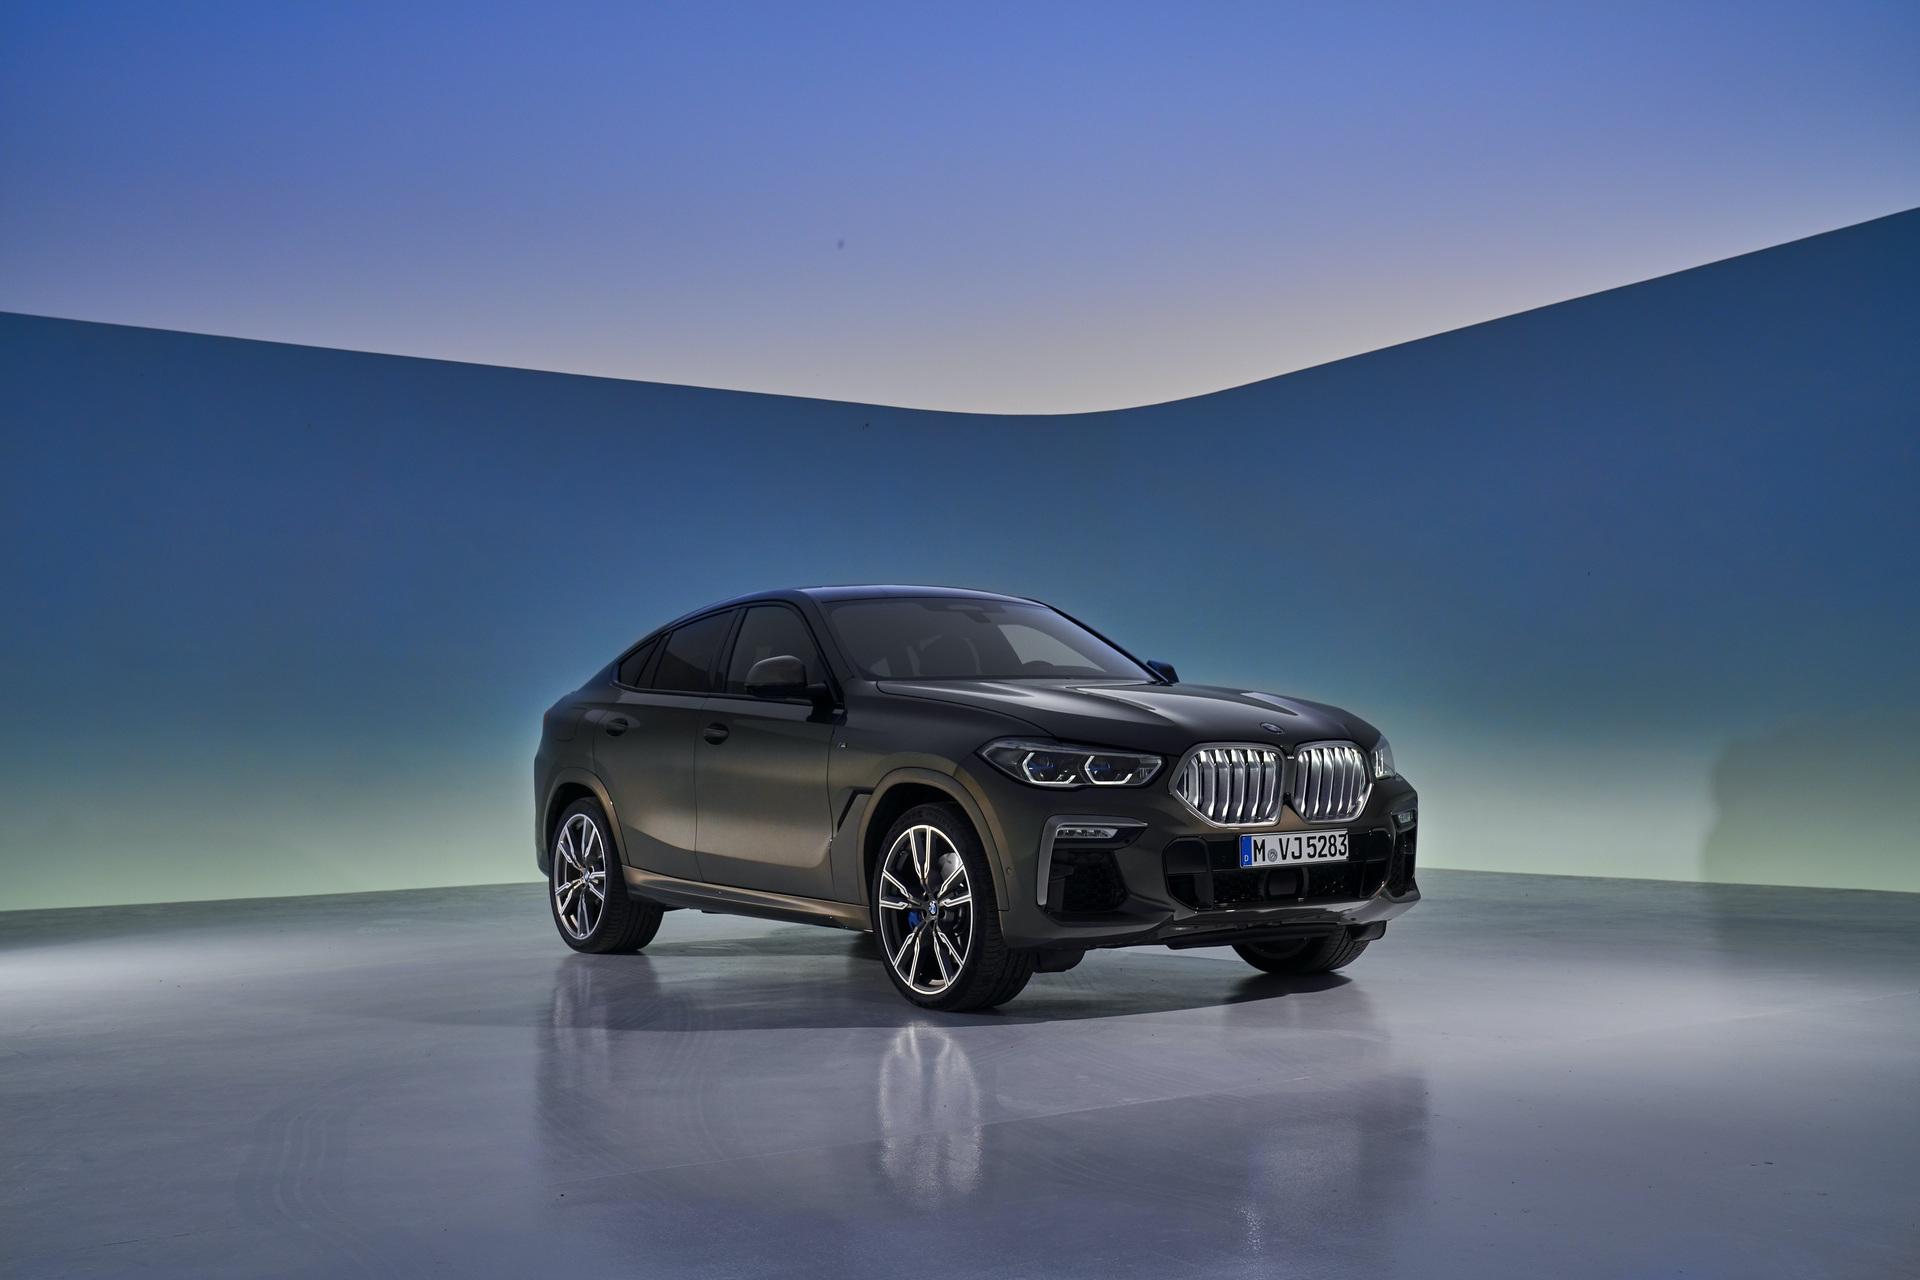 2020 BMW X6 exterior design 05